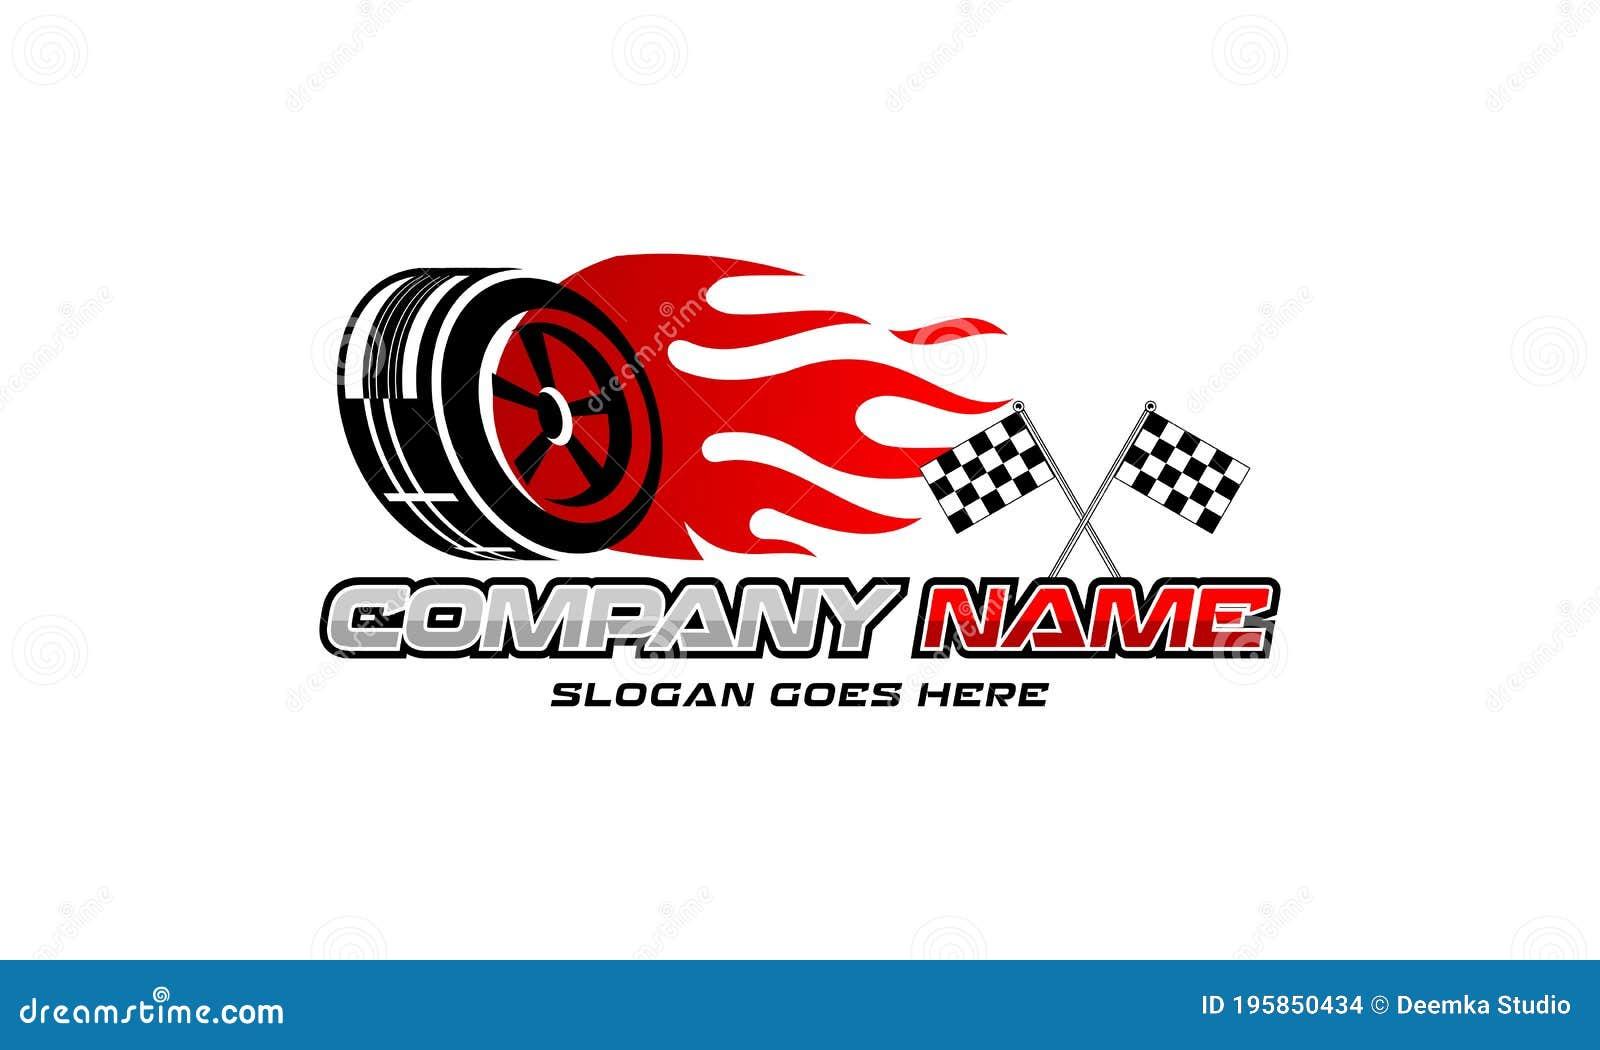 Auto Repair Services Automotive Logo Ideas Sample Vehicle Logos Stock Illustration Illustration Of Automobile Emblem 195850434